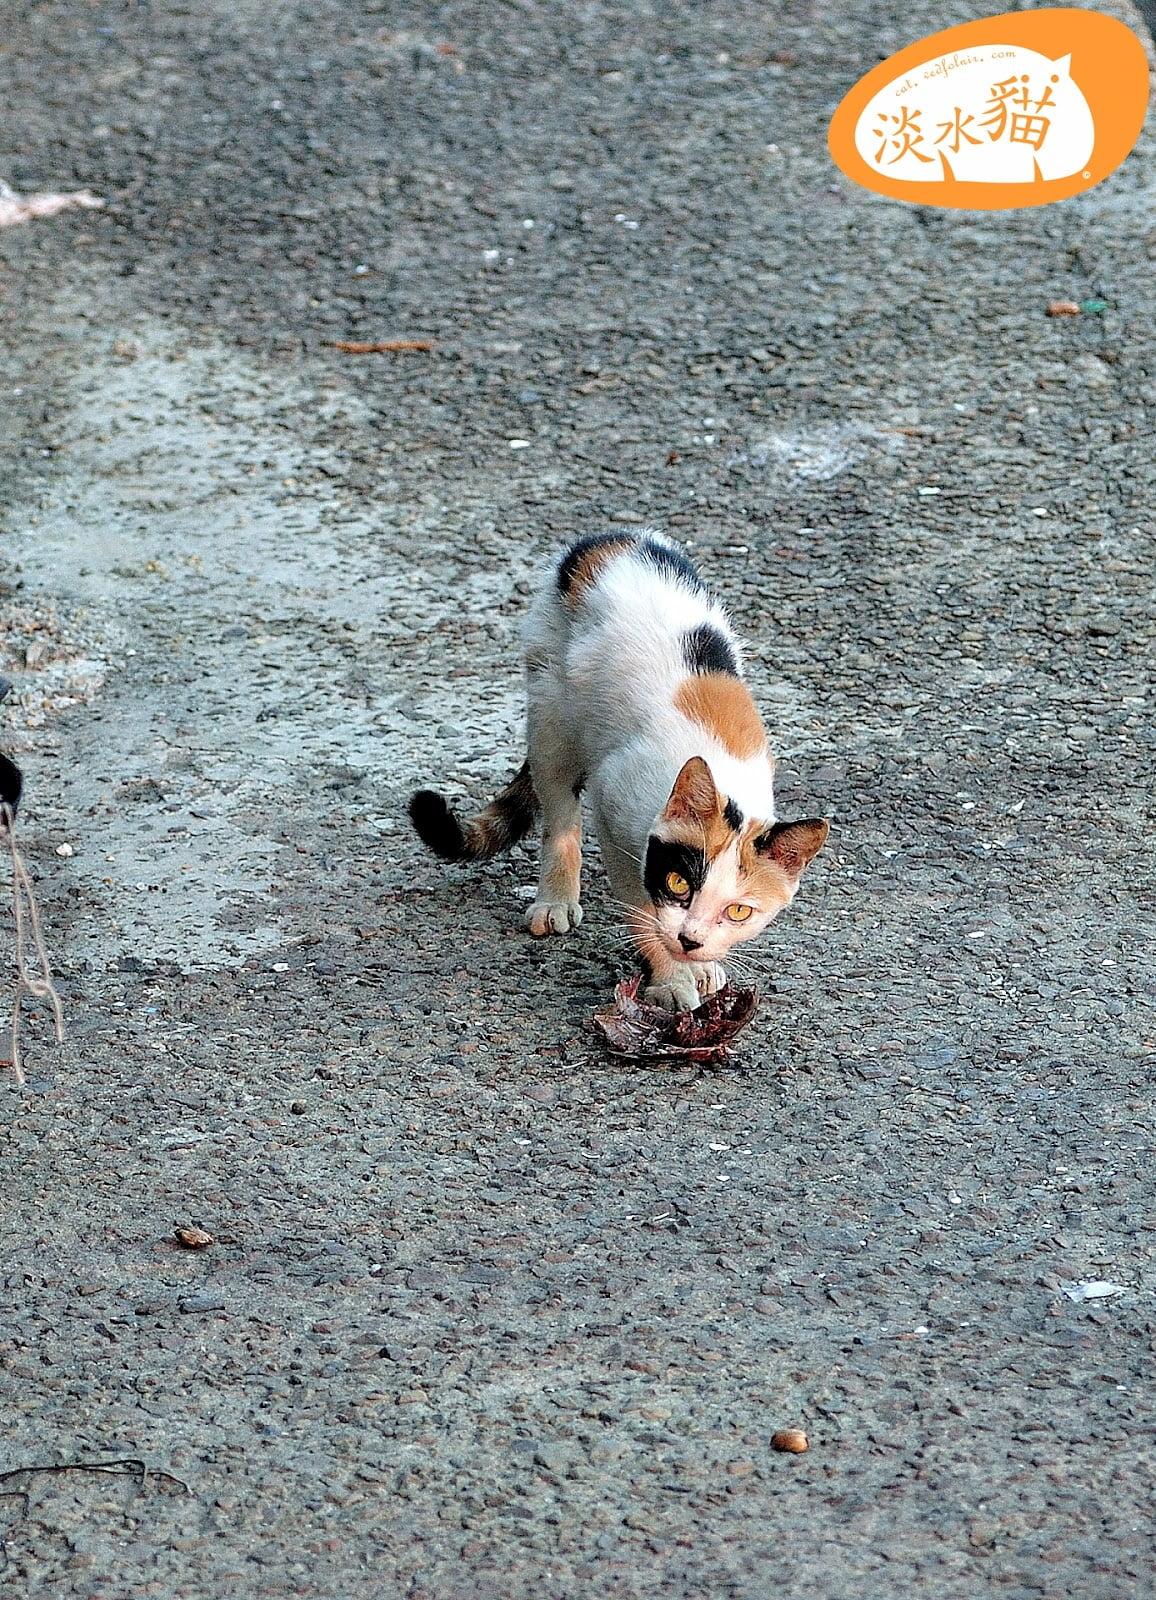 Tamsui-Street-Cat-淡水-街貓-捕魚-vedfolnir